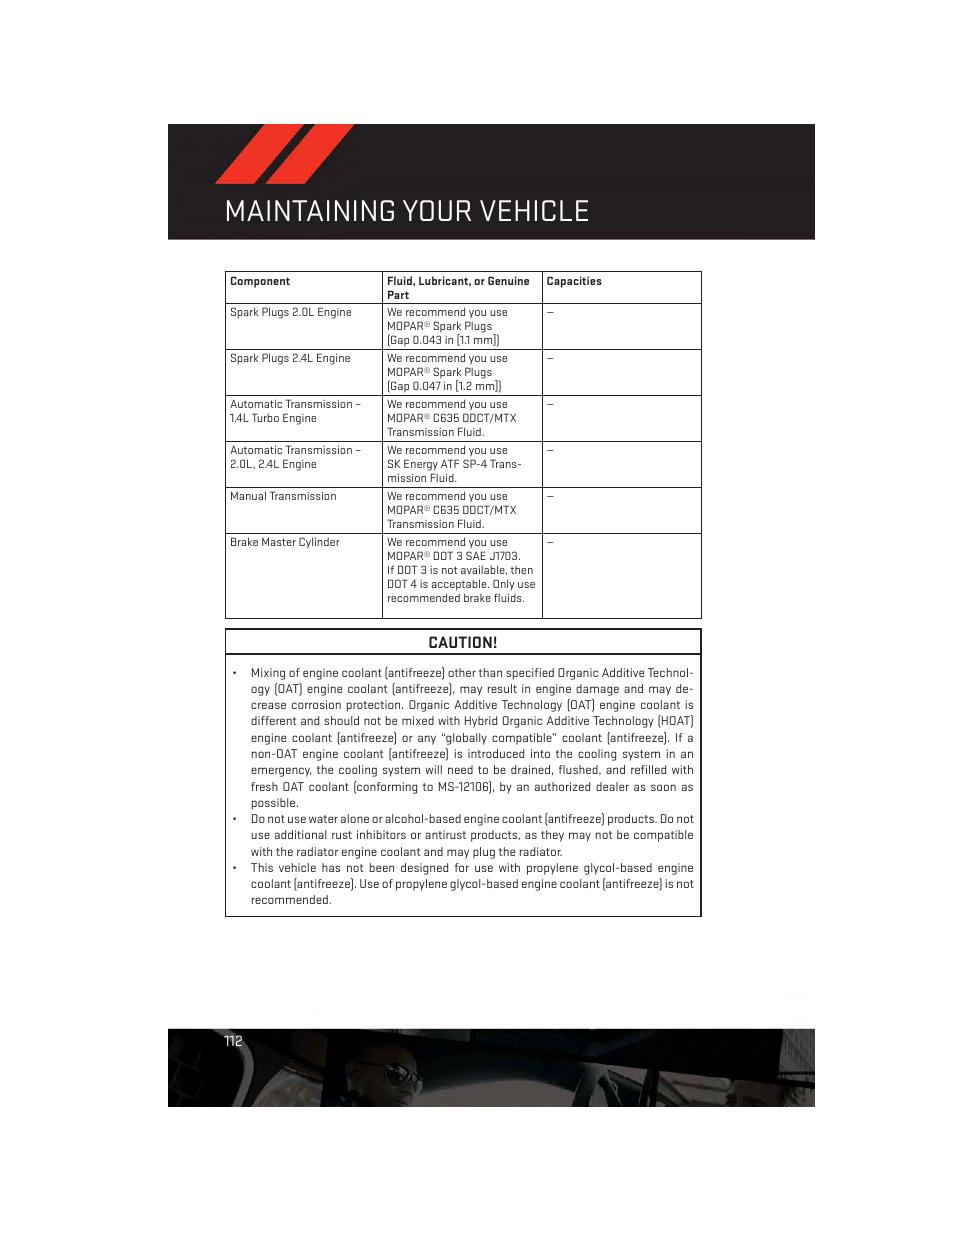 maintaining your vehicle caution dodge 2014 dart user guide rh manualsdir com dodge caravan 2014 user guide dodge user manual